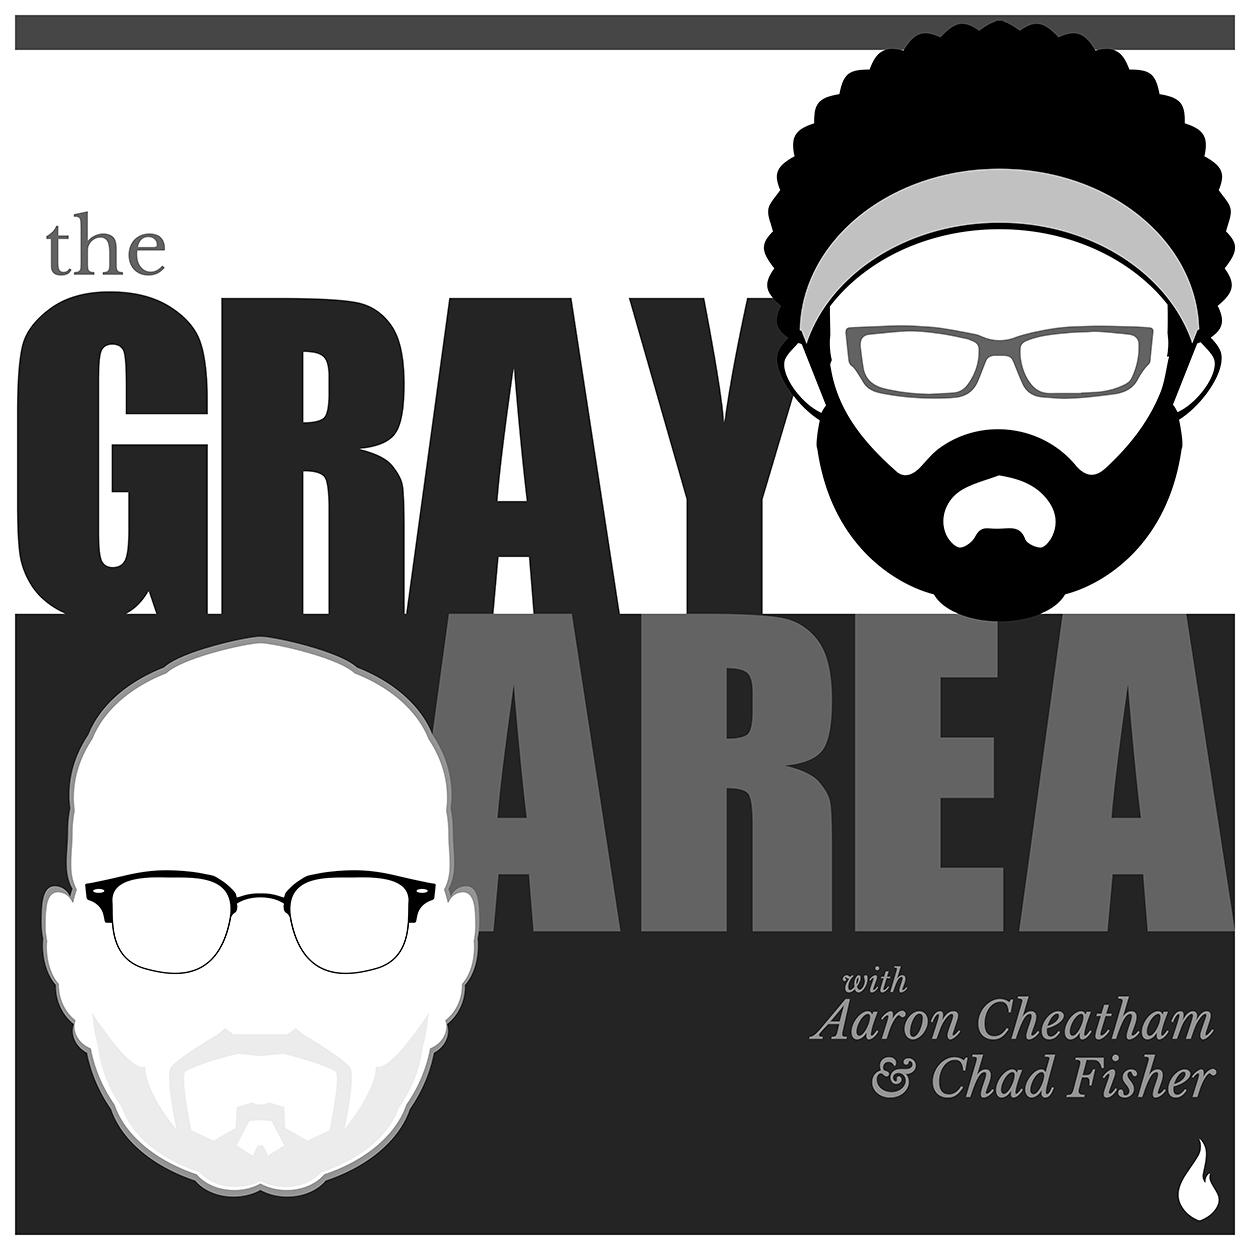 madison ave graphics podcast design